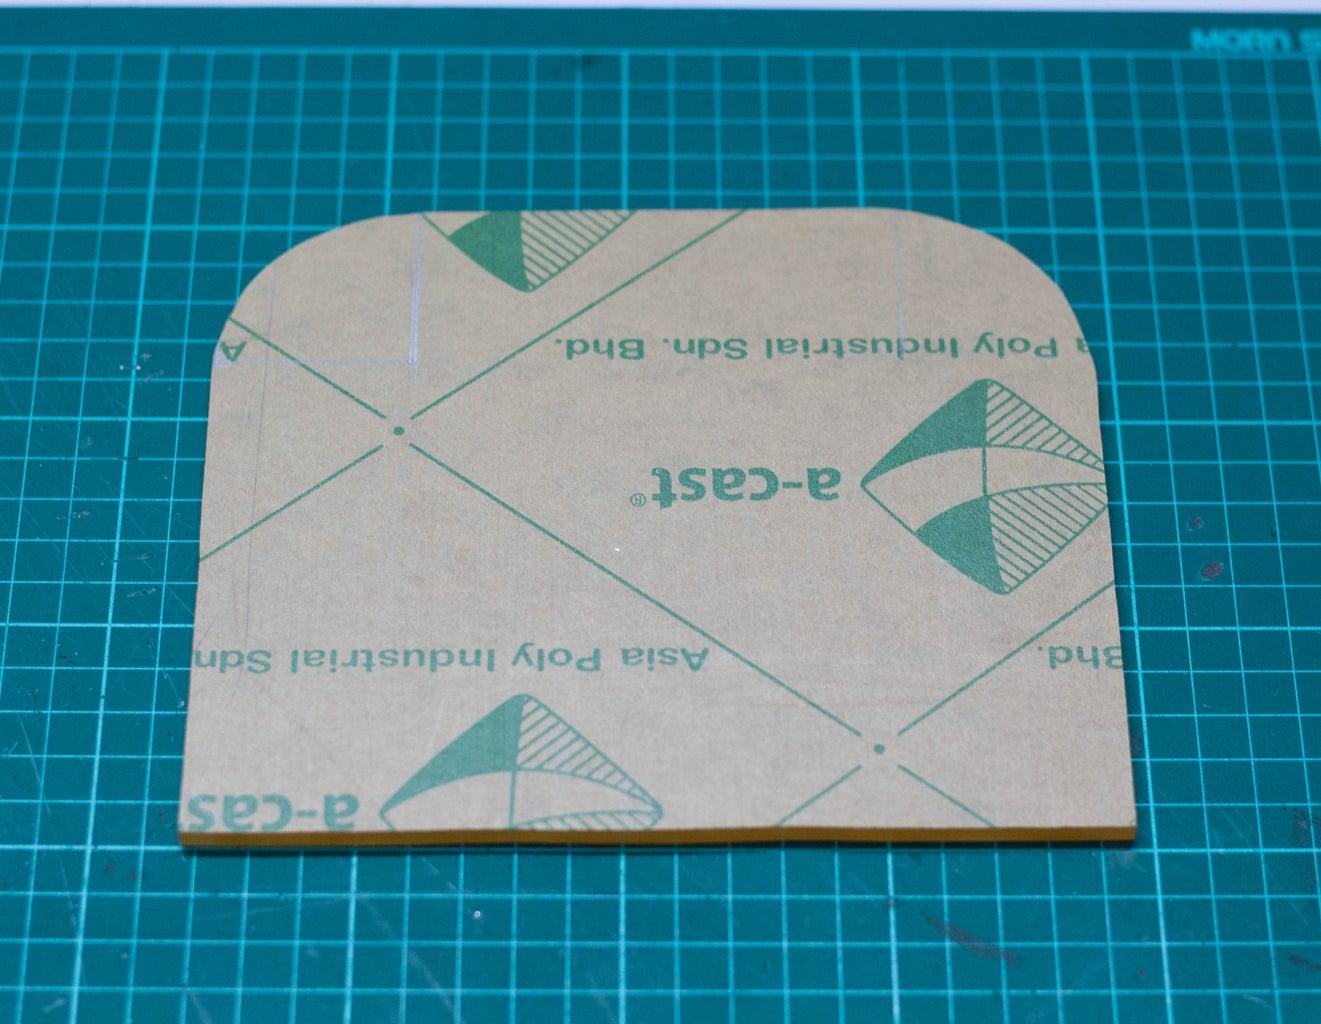 Cutting the Acrylic Sheet